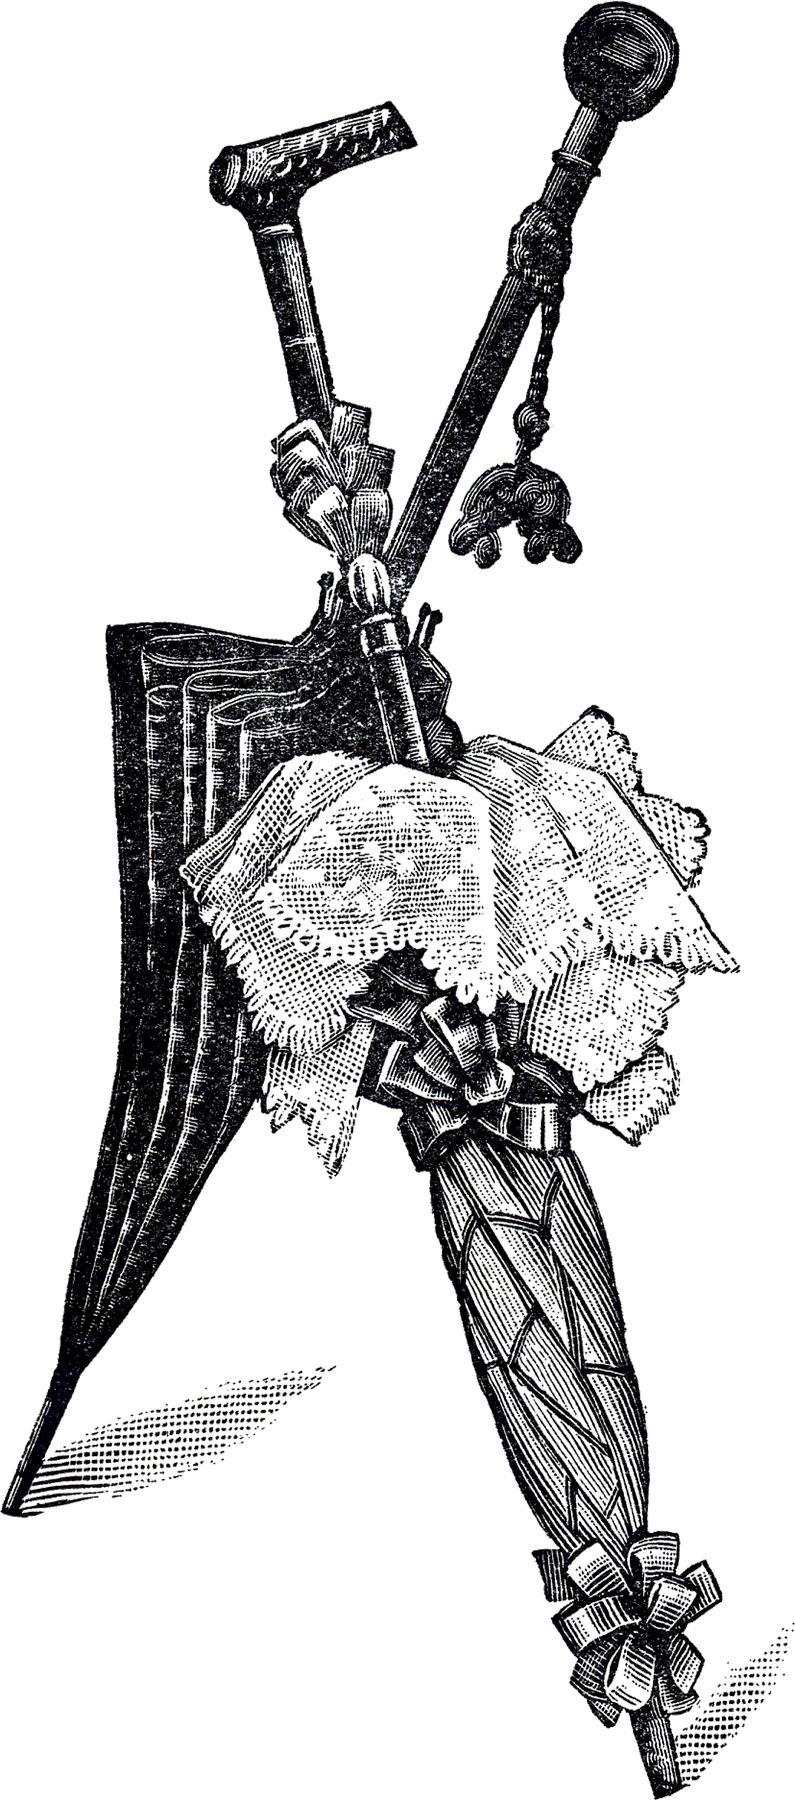 The Graphics Fairy: Free Vintage Umbrellas Clip Art!